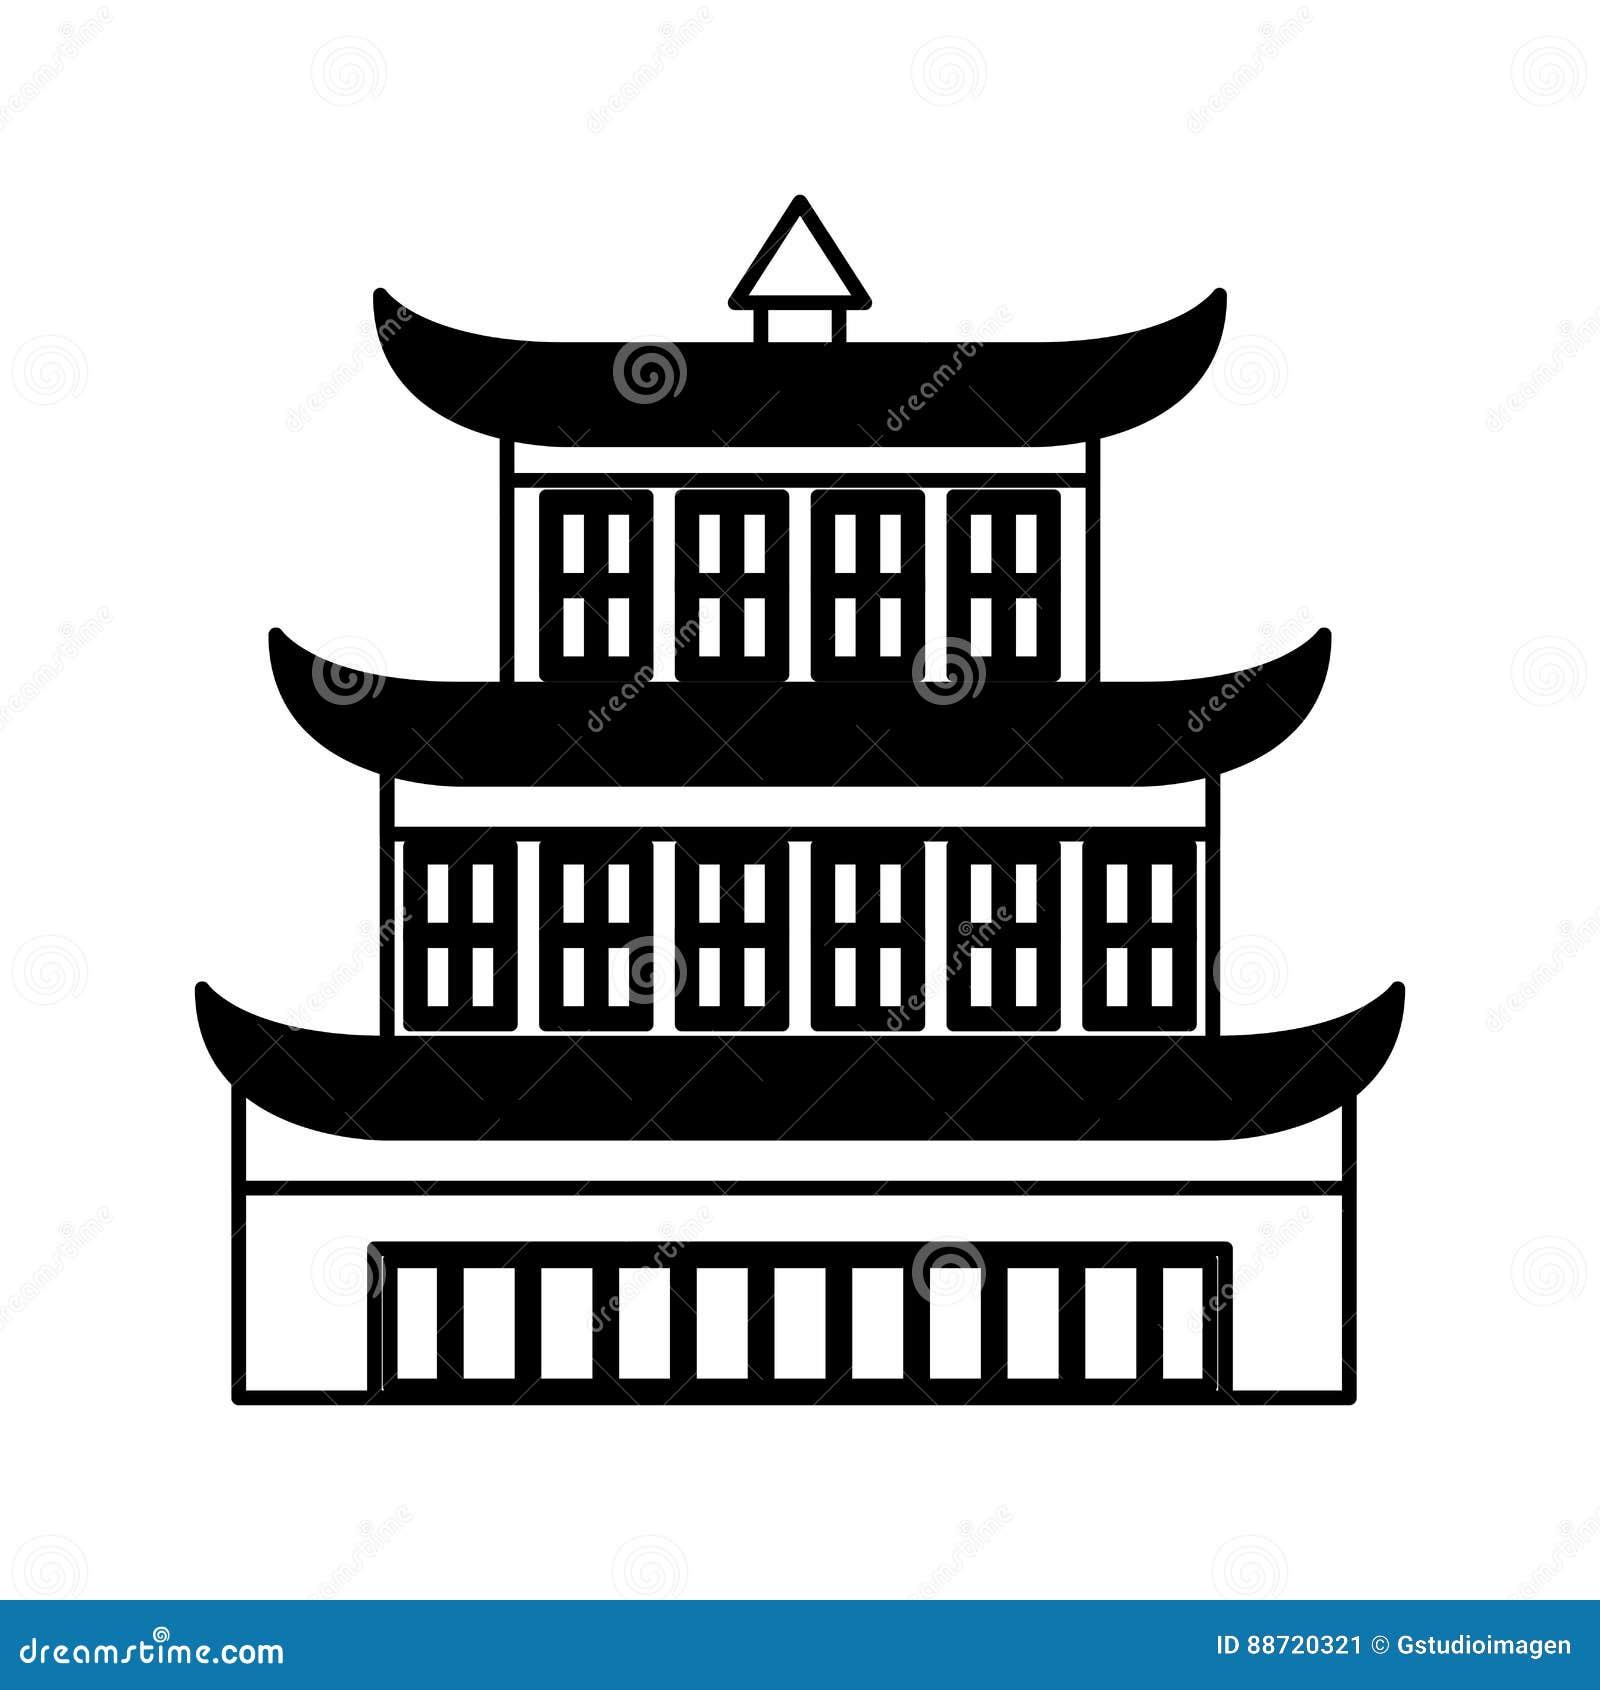 asian building castle icon stock vector - image: 88720321